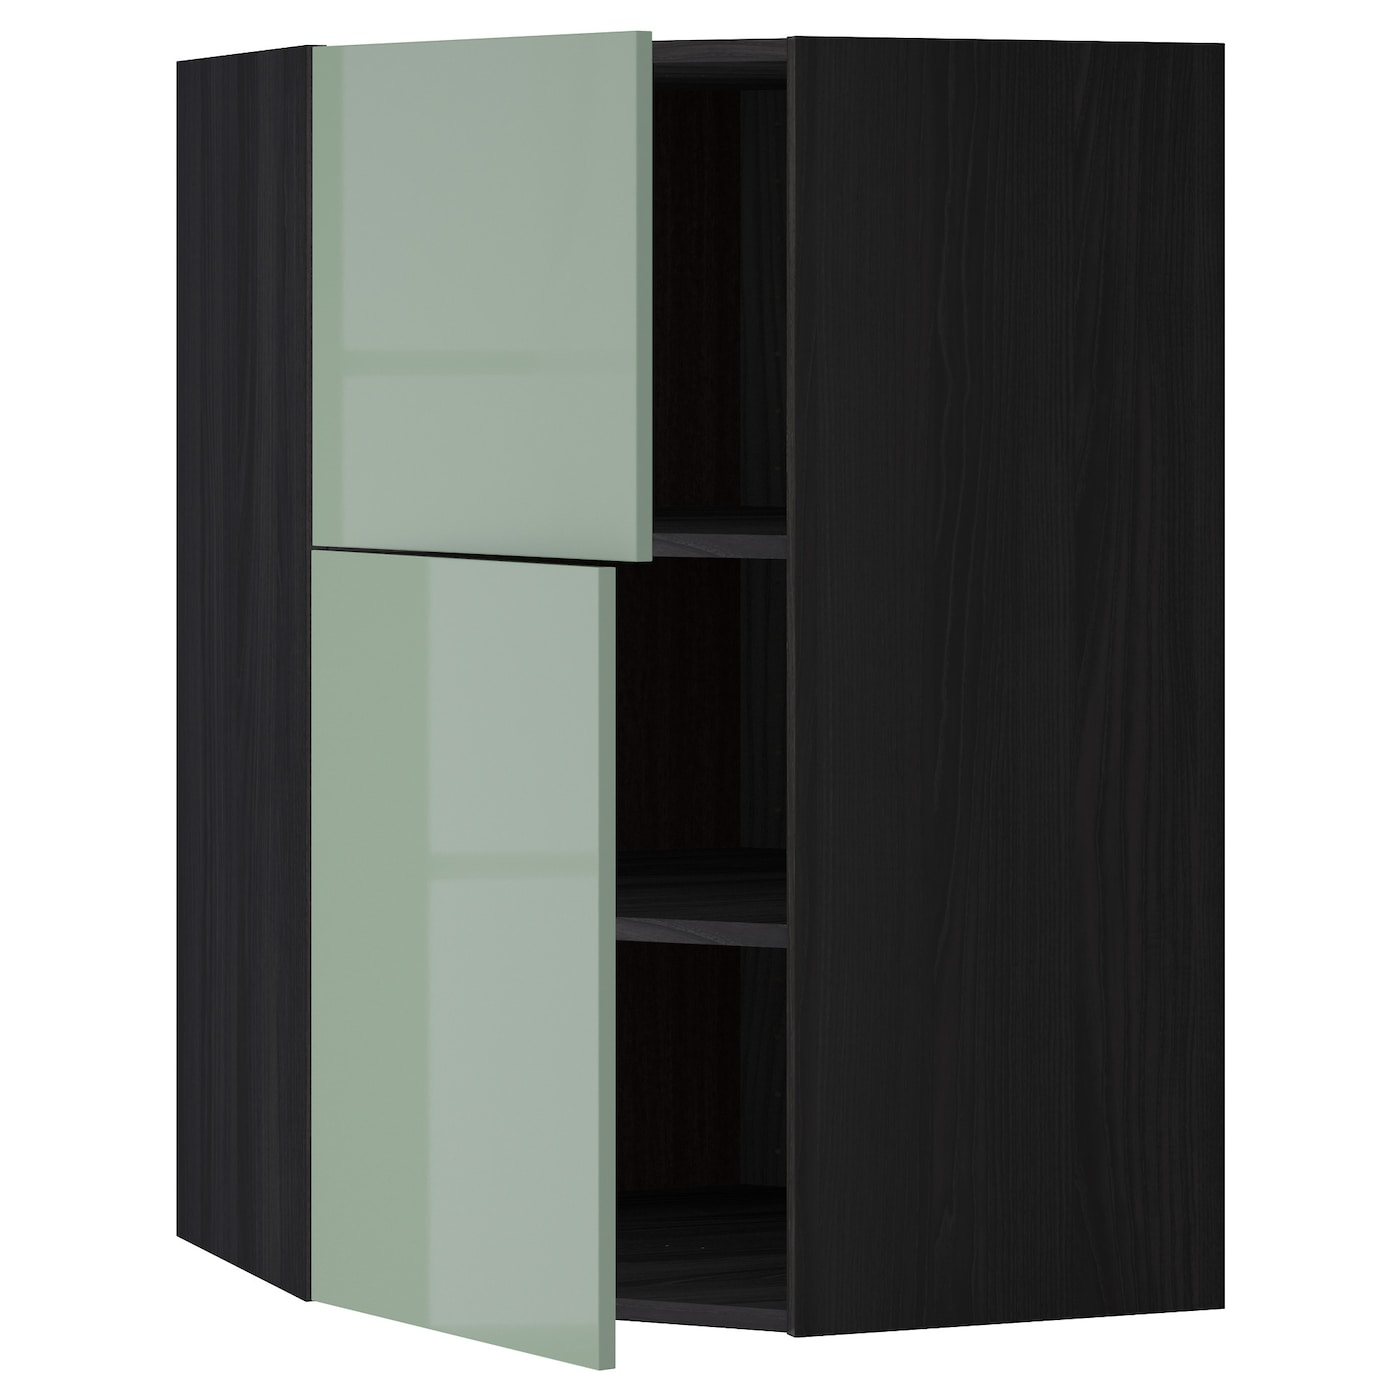 Metod Corner Wall Cab W Shelves 2 Doors Black Kallarp